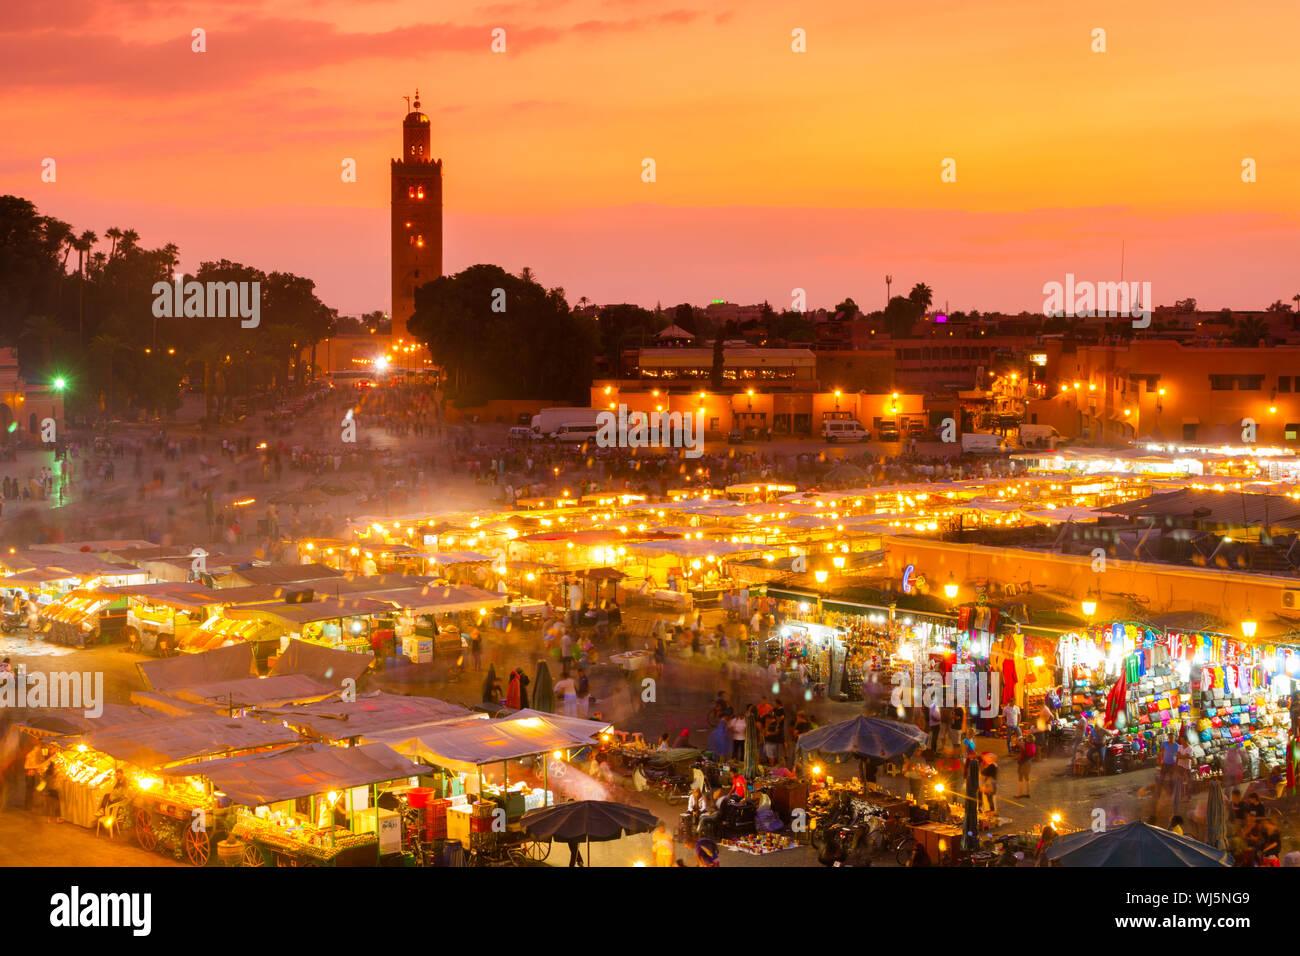 Jamaa el Fna also Jemaa el Fnaa, Djema el Fna or Djemaa el Fnaa is a square and market place in Marrakesh's medina quarter (old city). Marrakesh, Moro Stock Photo